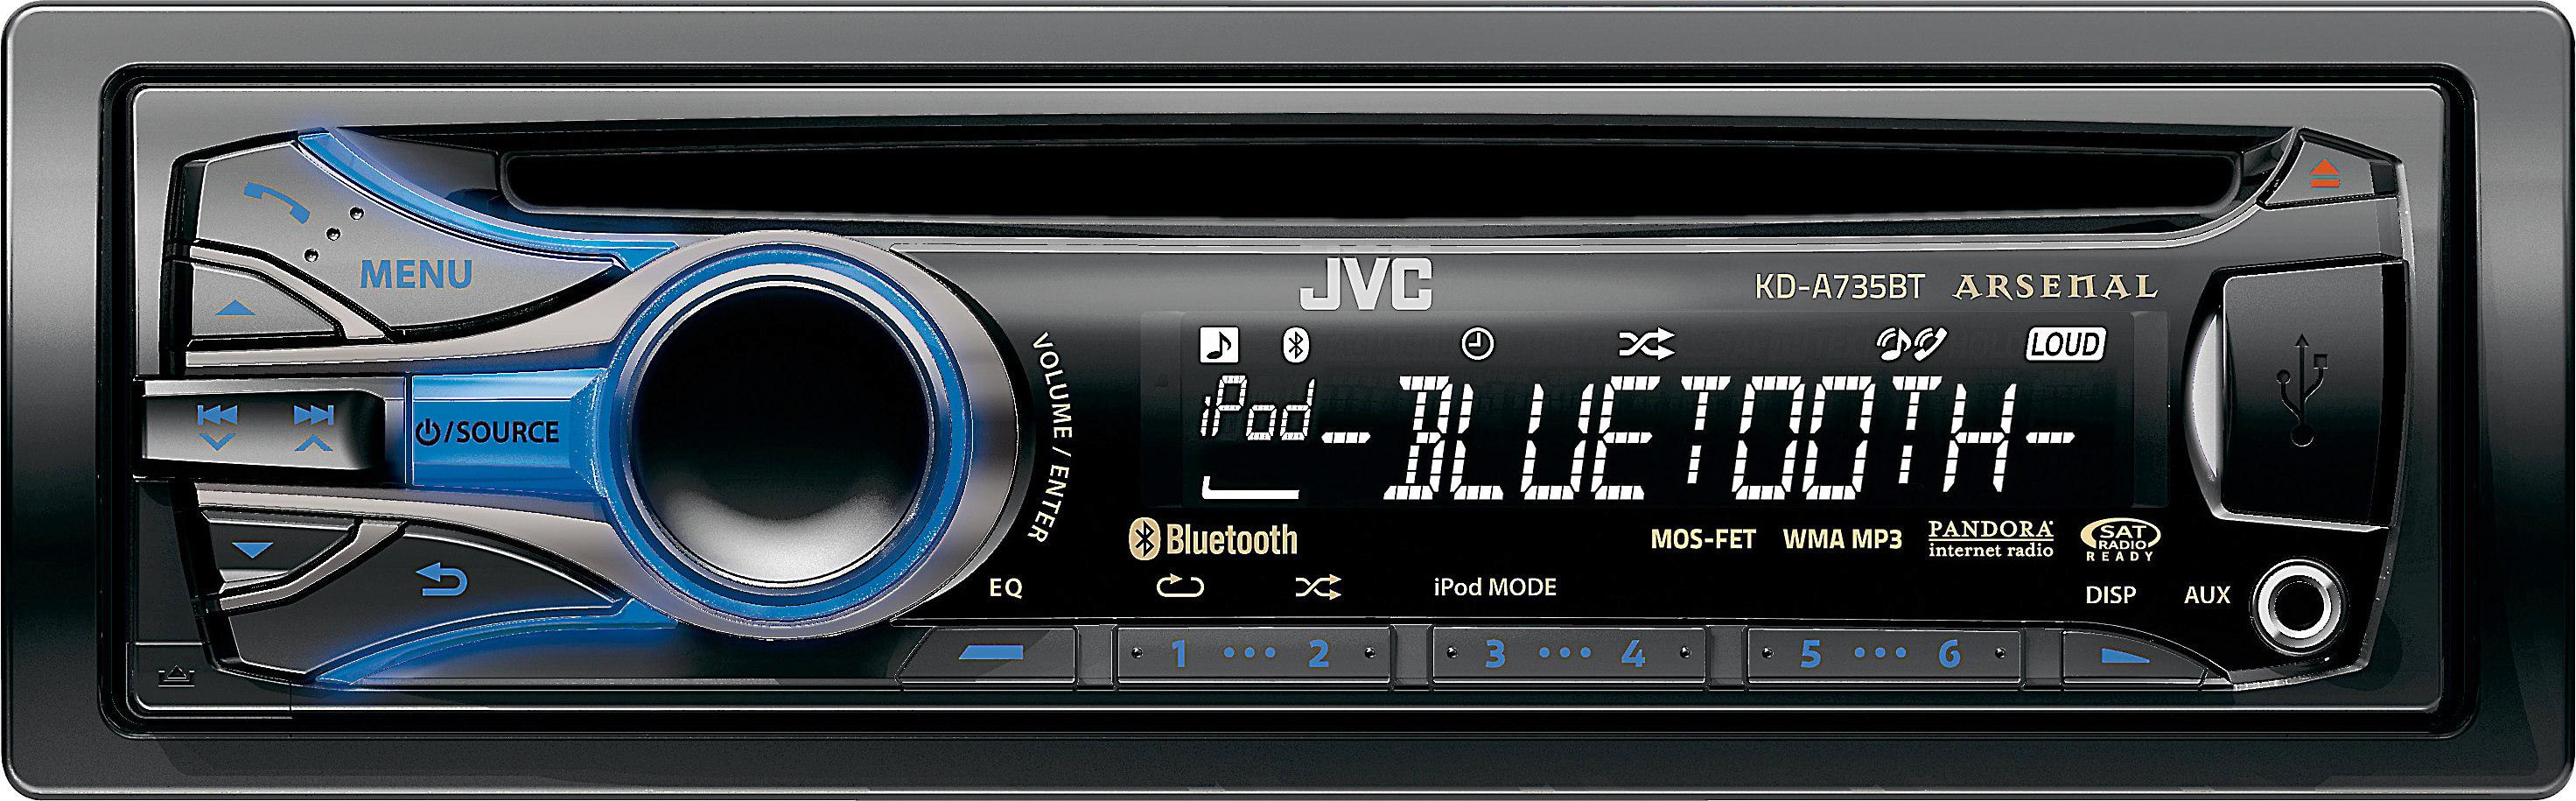 JVC Arsenal KD-A735BT